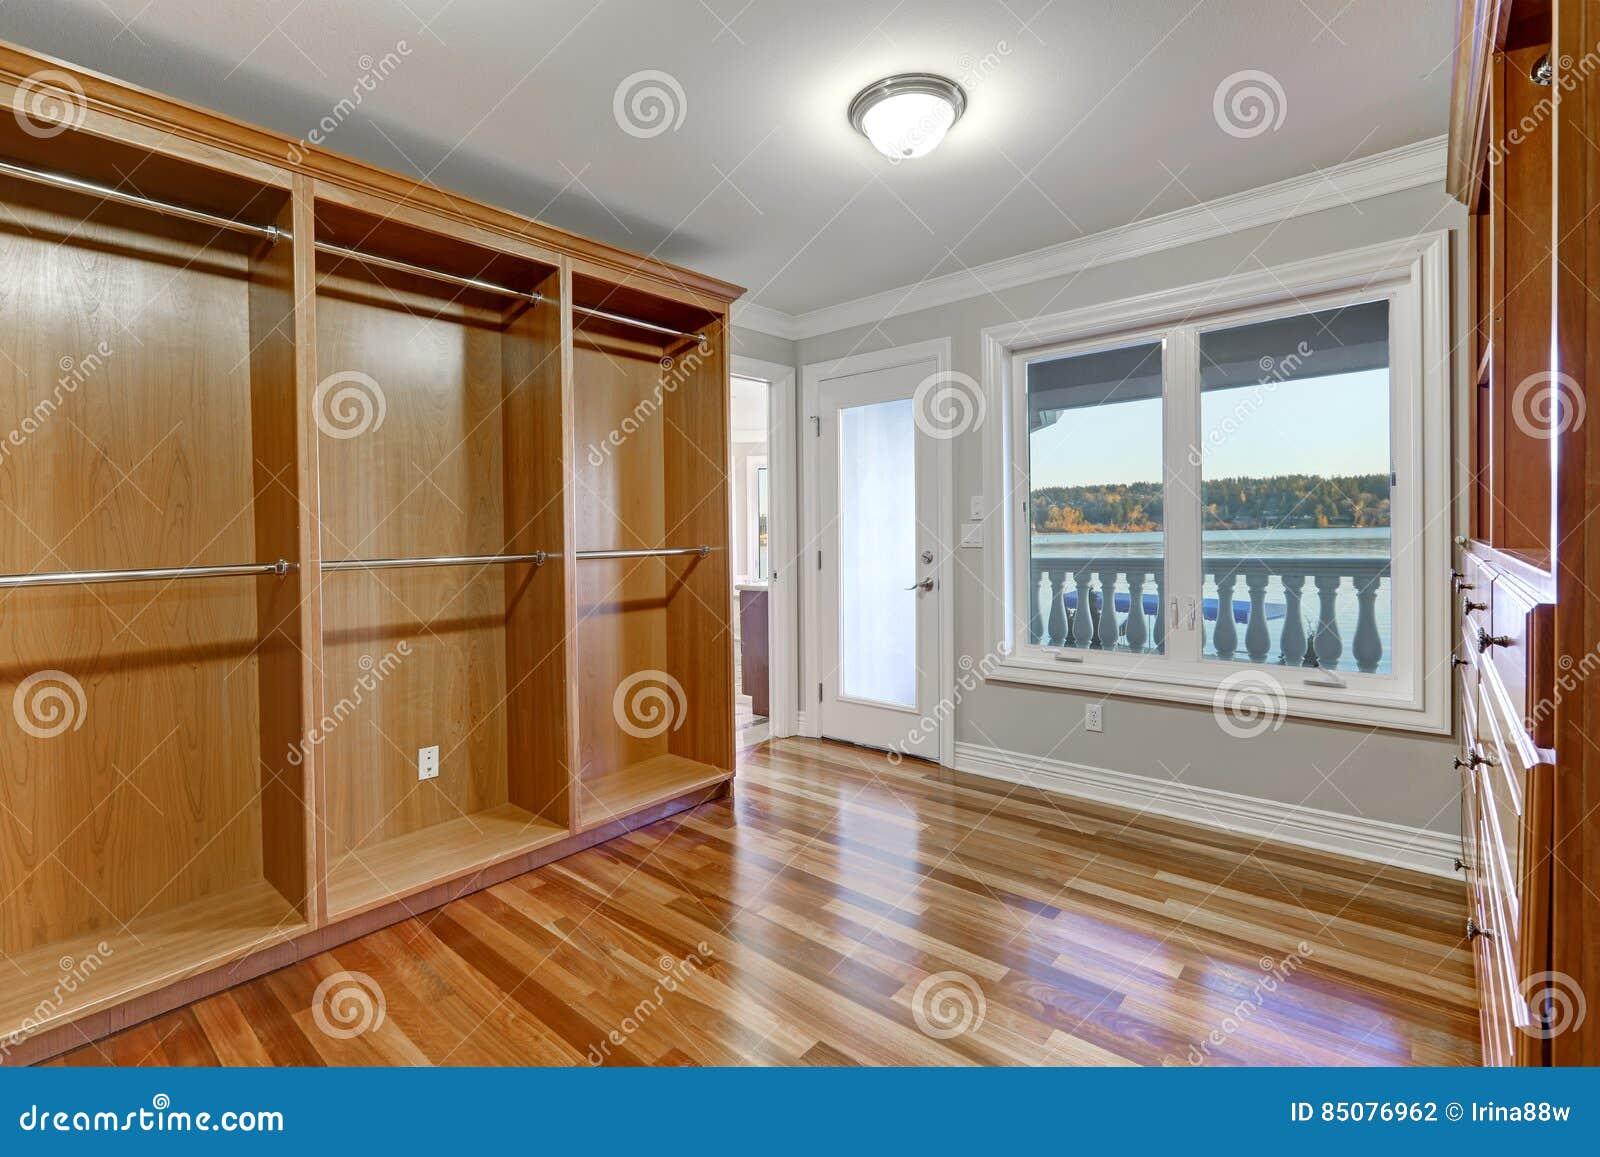 Kast Voor Balkon : Lege gang in kast met hardhoutvloer en deur aan balkon stock foto